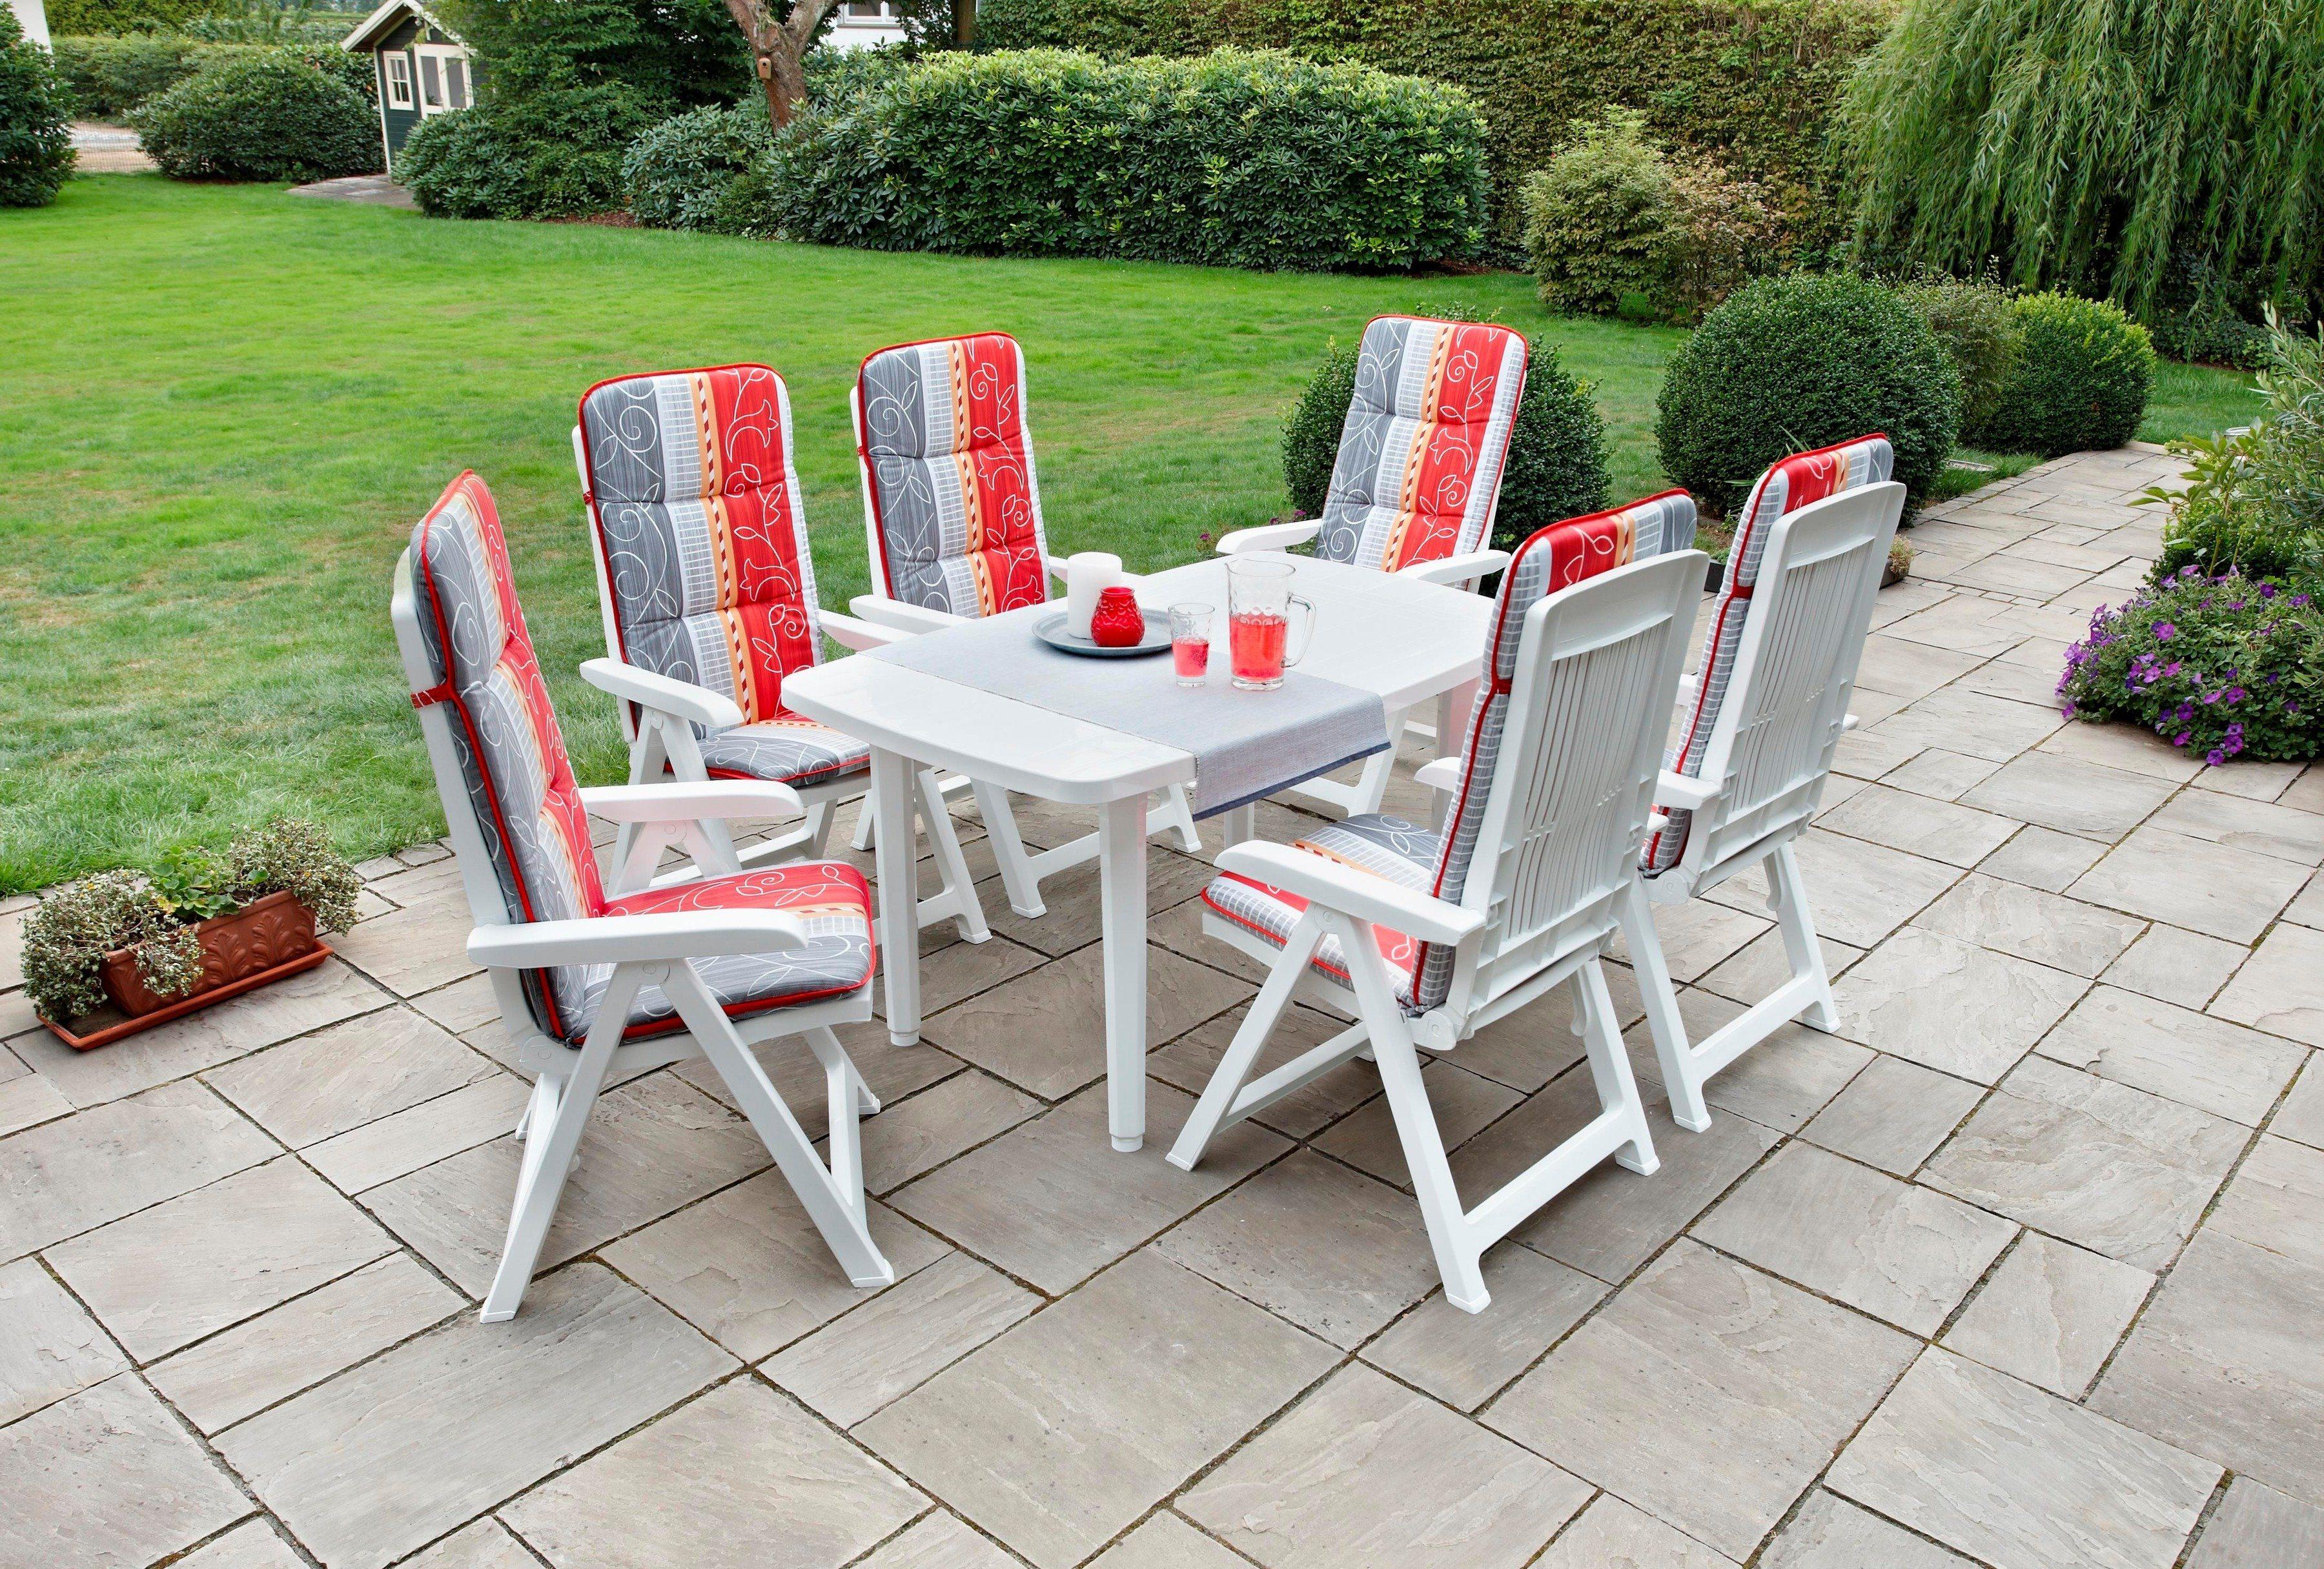 Best 13-tgl. Gartenmöbelset »Kopenhagen«,6 Sessel,Tisch 140x85 cm,Kunststoff,weiß,inkl. Auflagen,klappbar